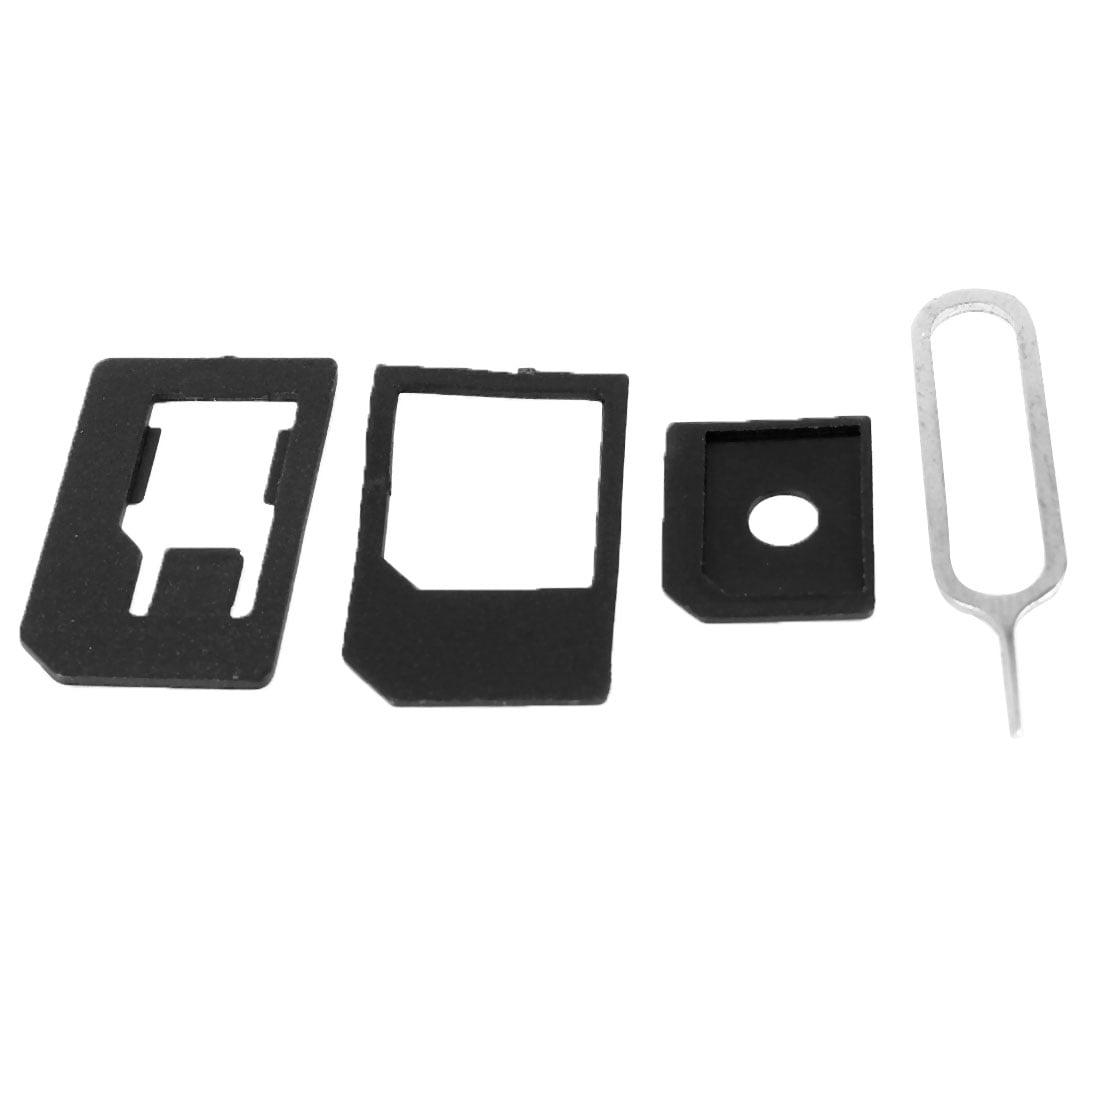 4 in 1 SIM Card Adapter Nano to Micro/ Nano to Full/ Micro to Full w Eject Pin - image 1 de 1